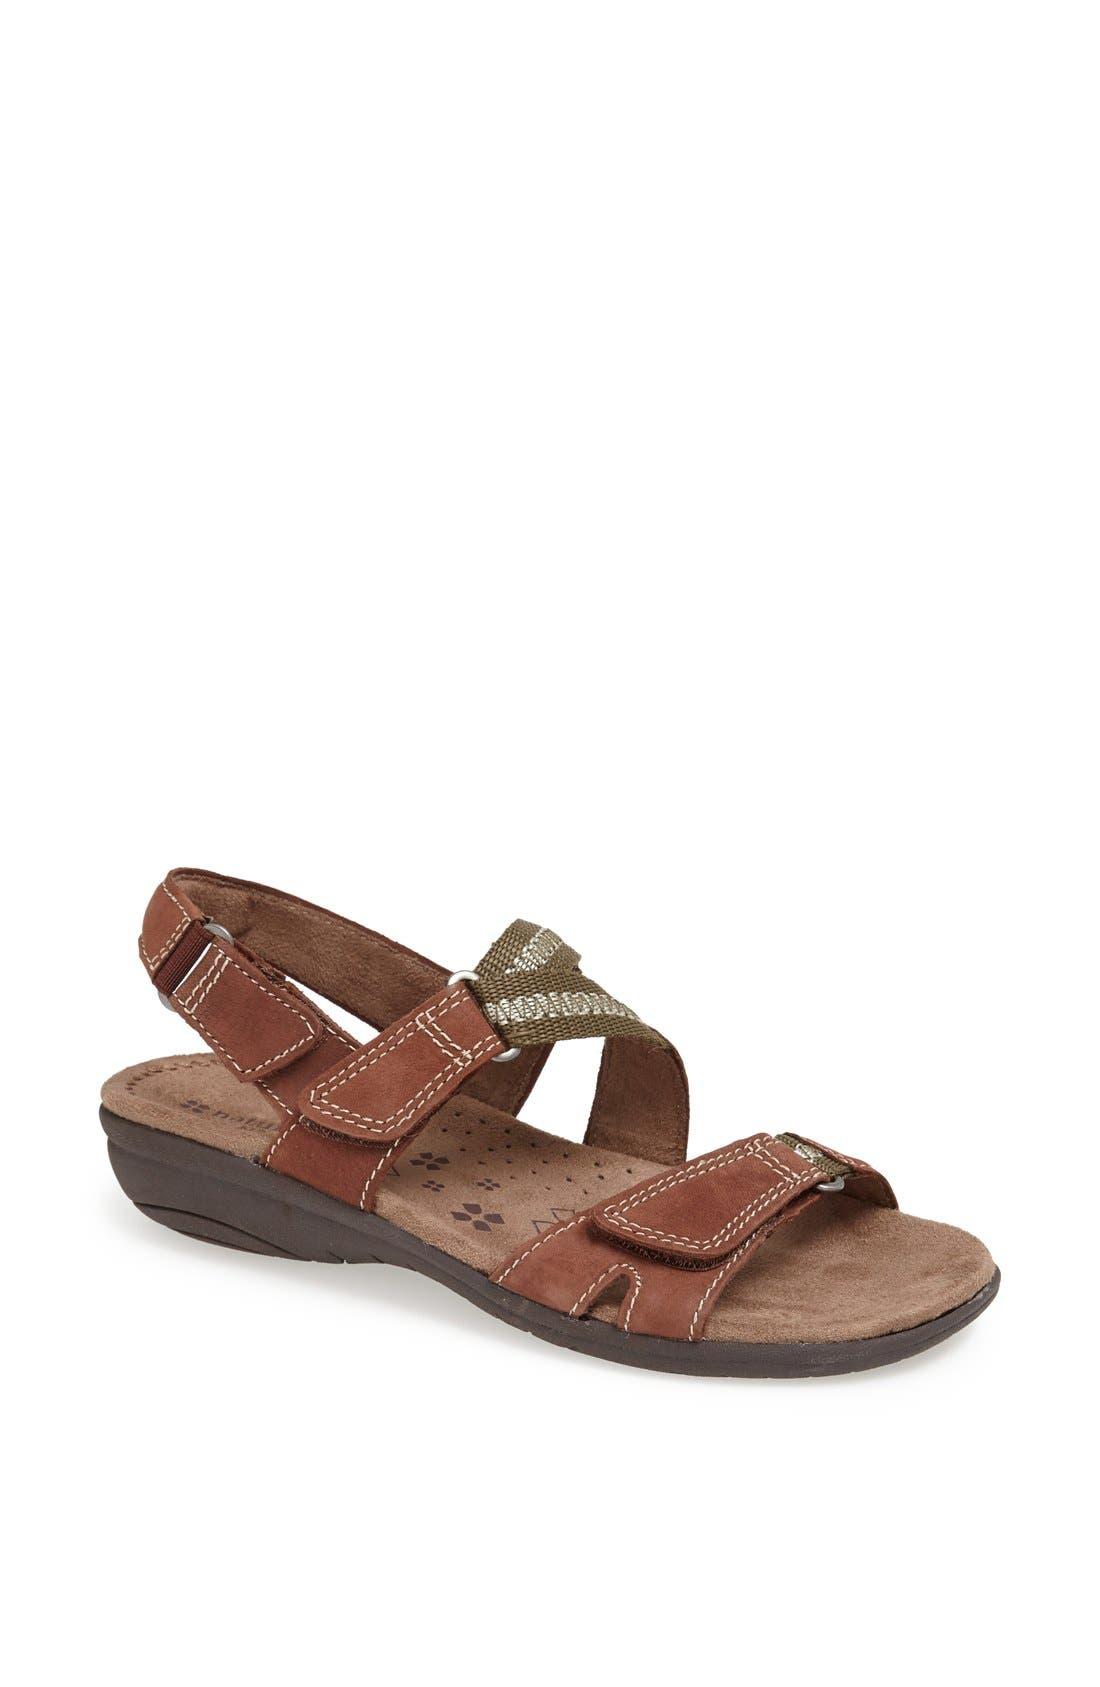 Alternate Image 1 Selected - Naturalizer 'Valero' Sandal